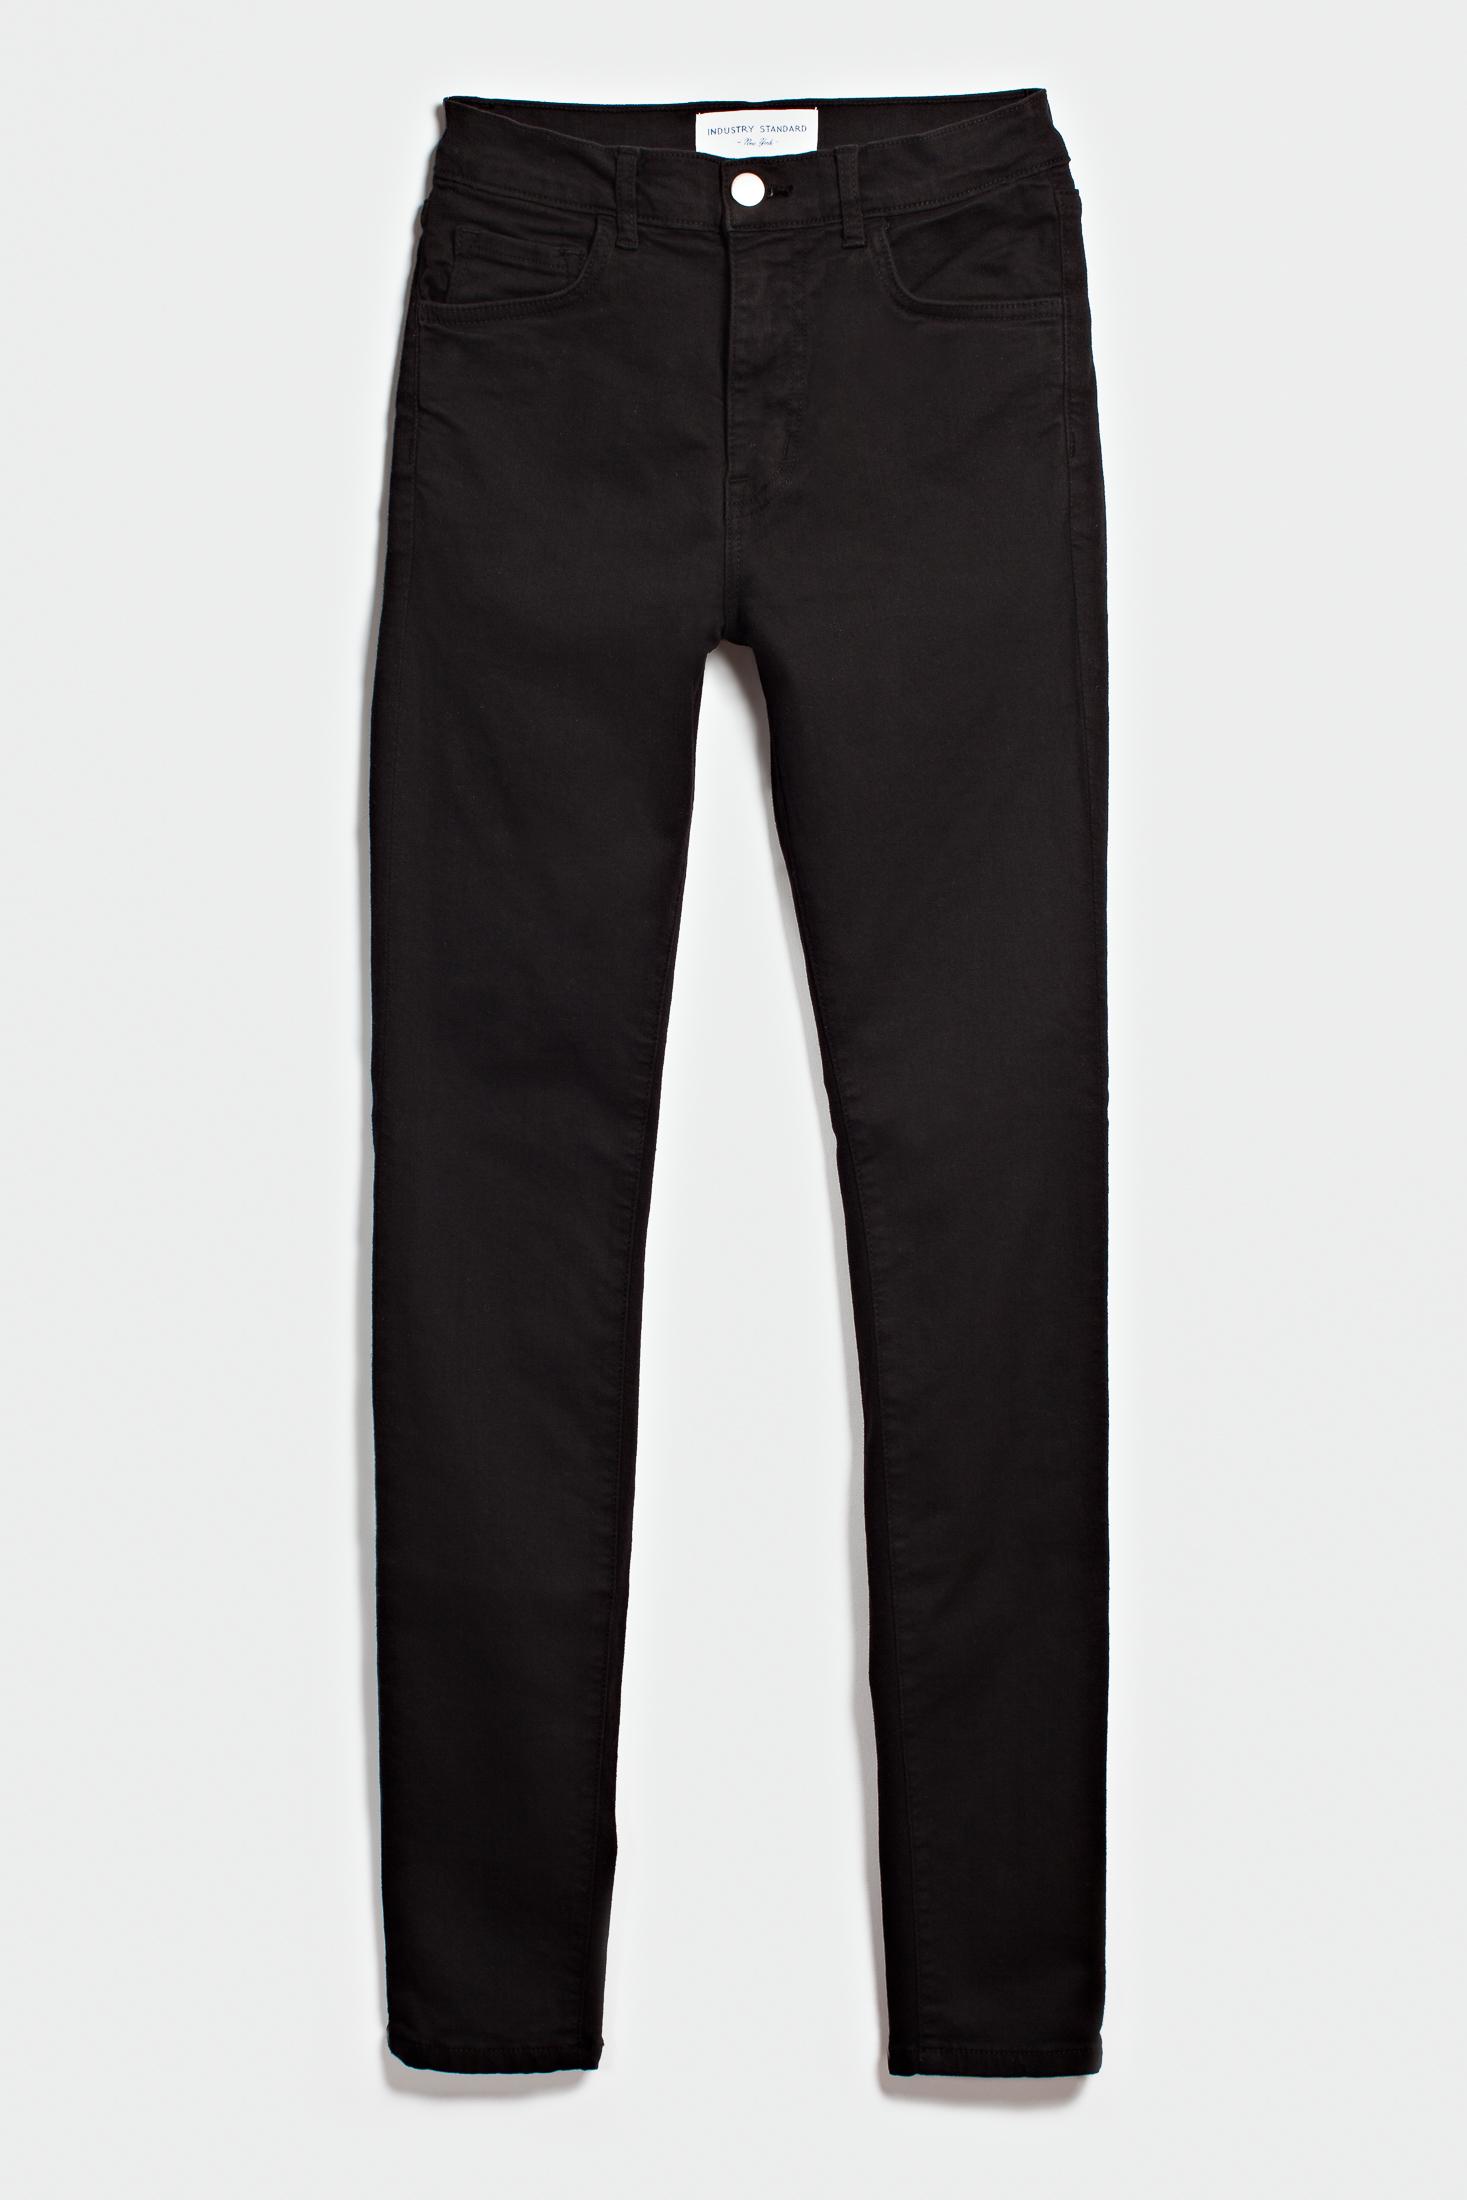 Industry-Standard-Simone-Highrise-Black.jpg